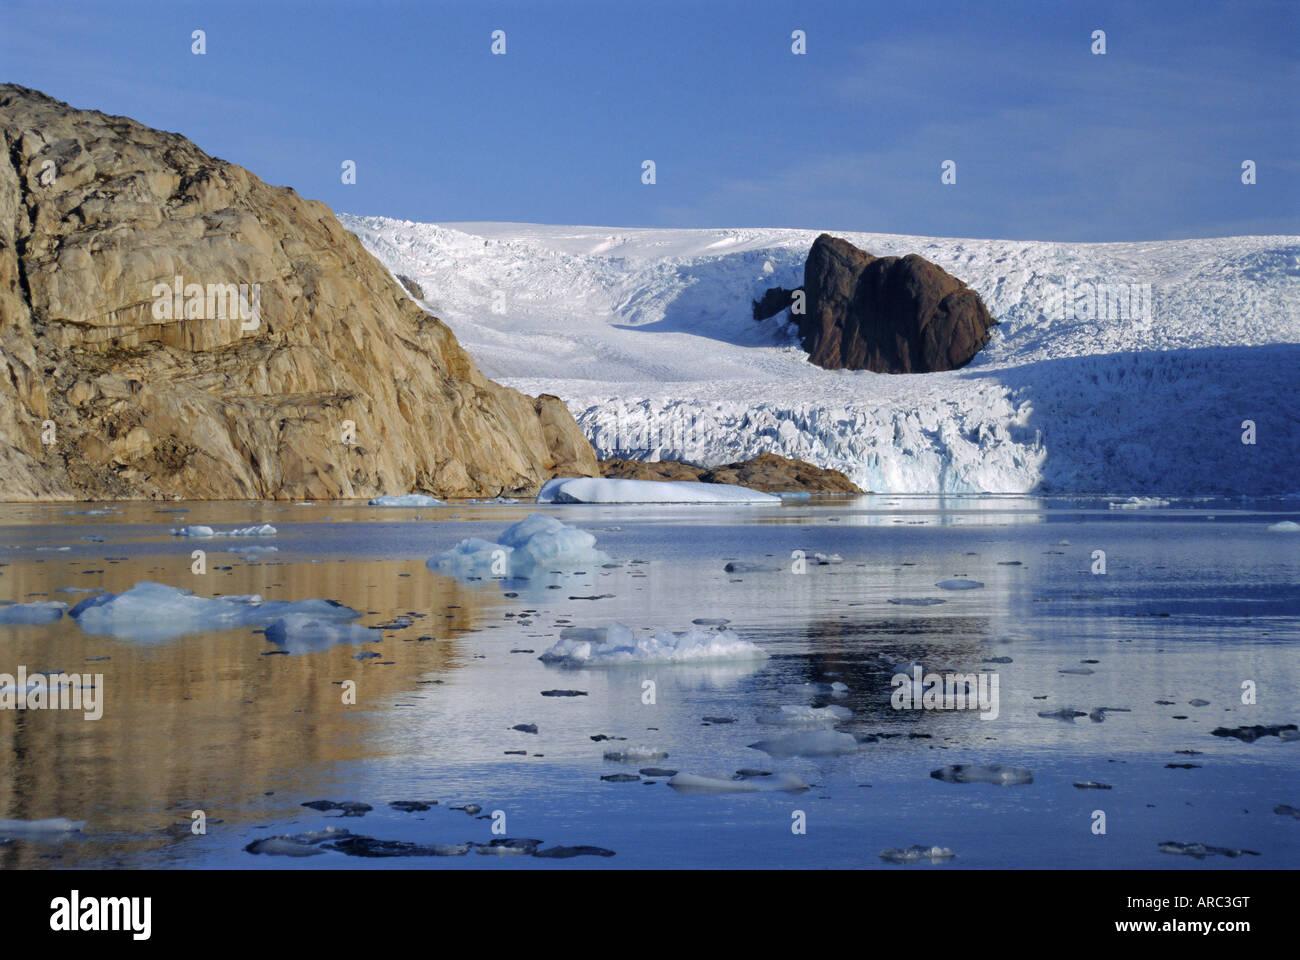 Glacier in Prins Christians Sund, South Greenland, Greenland - Stock Image